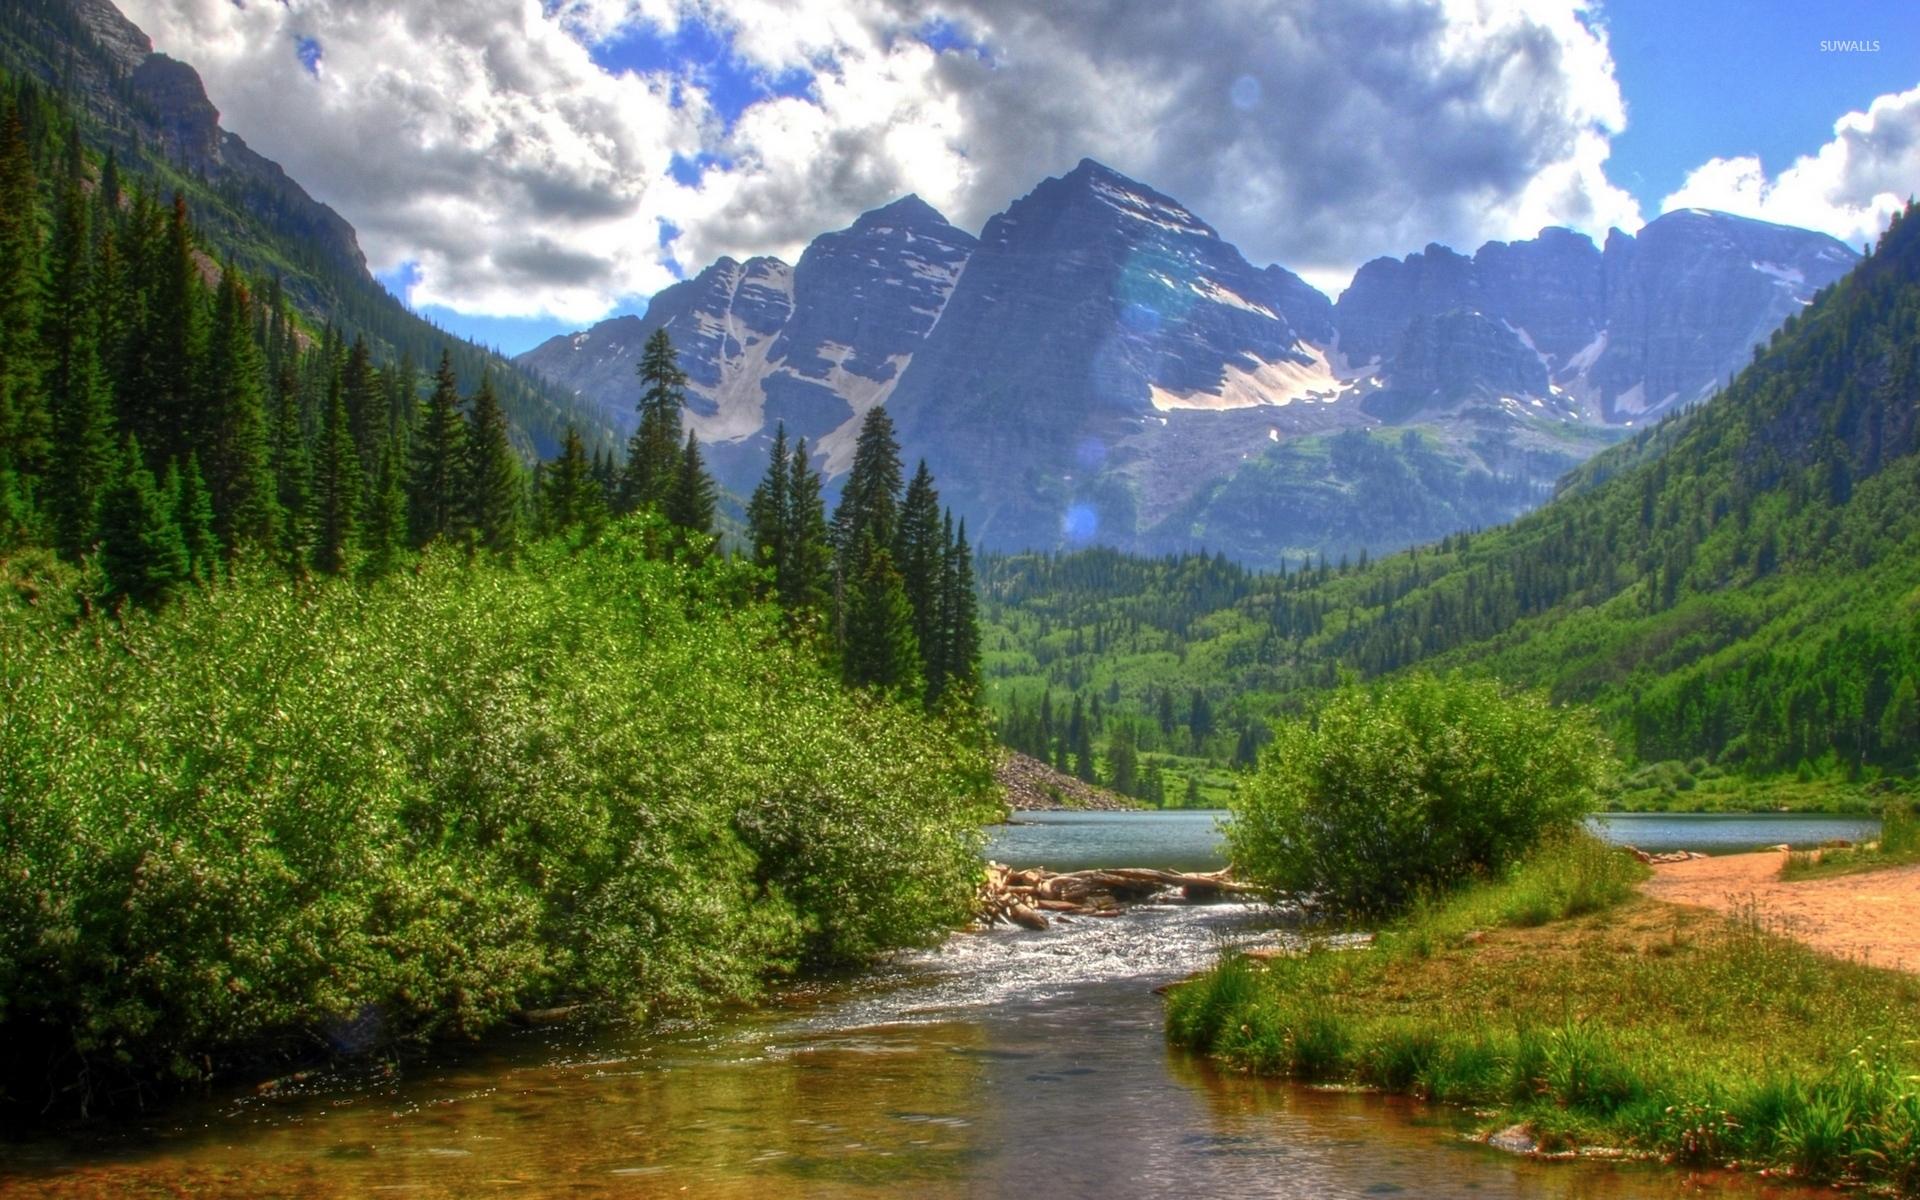 Summer Season Mountain Photo wallpaper 1920x1200